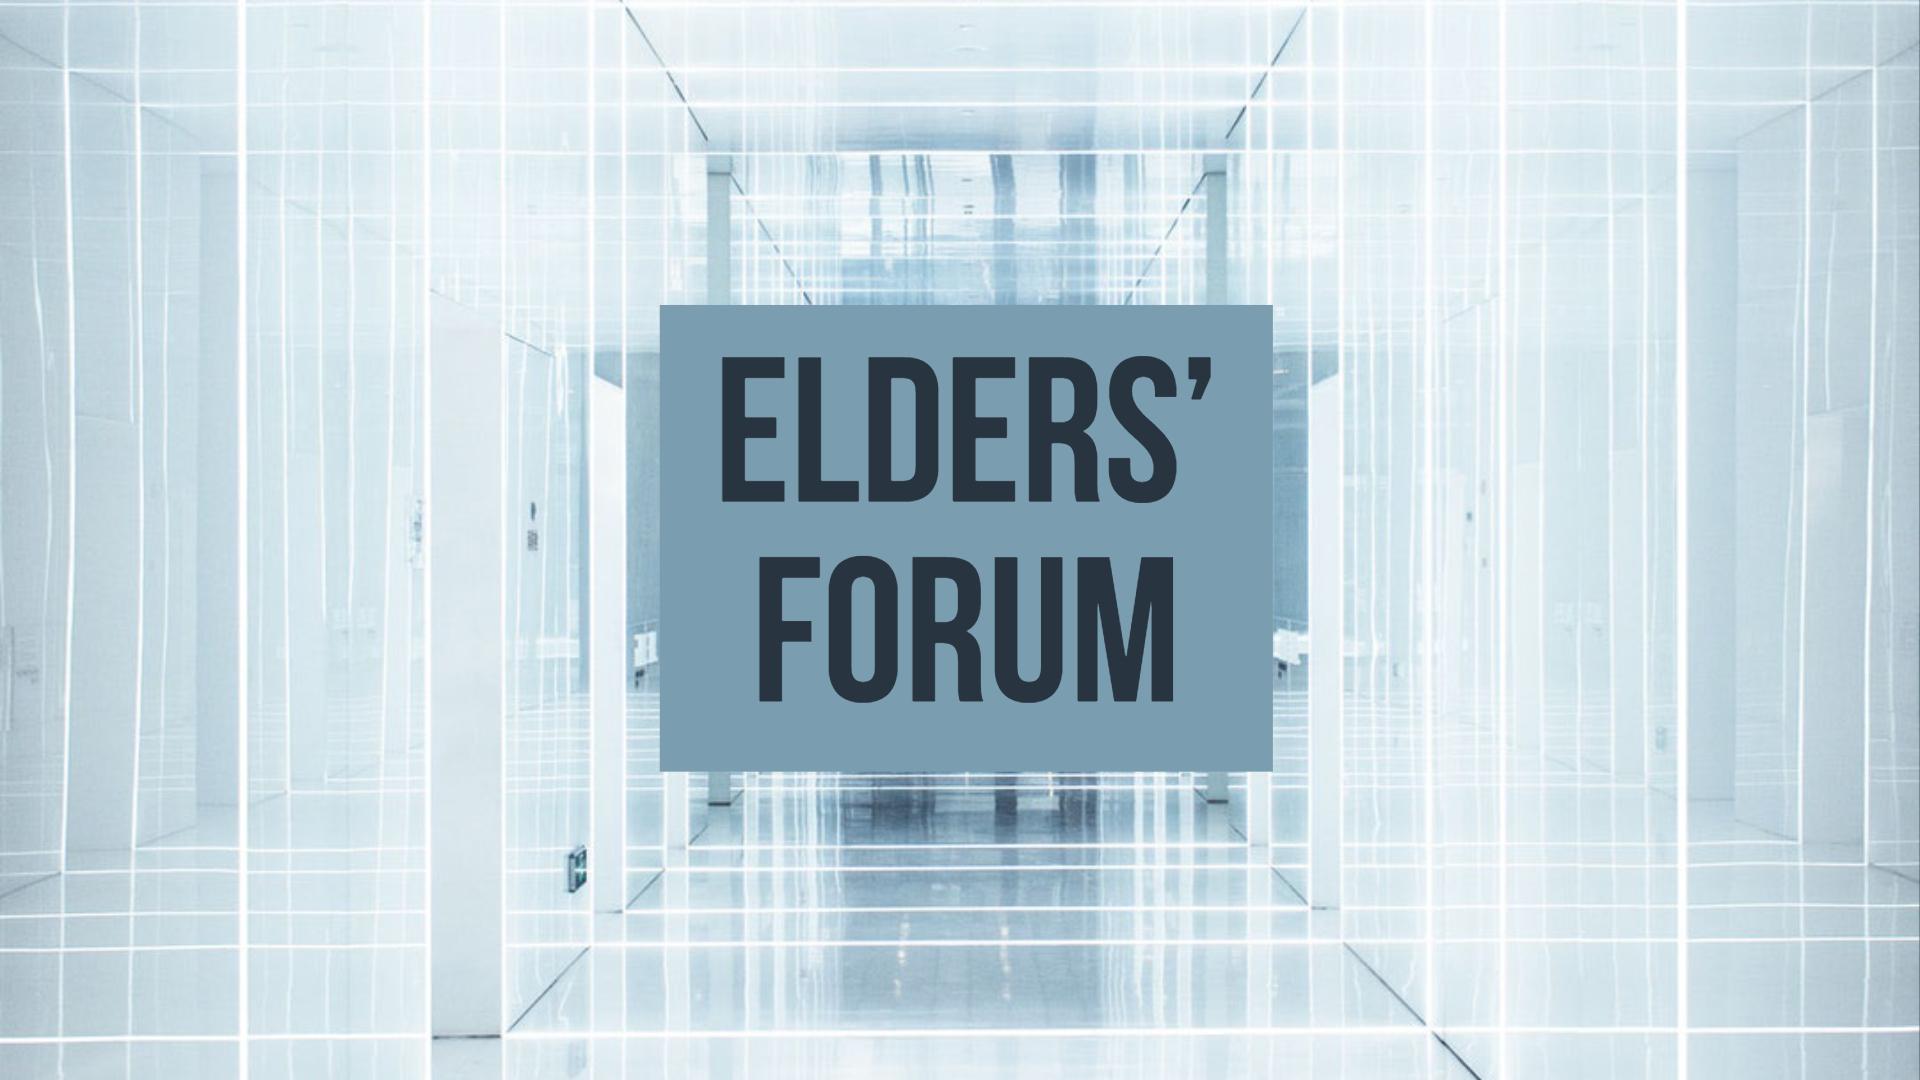 Elders Forum Mid image